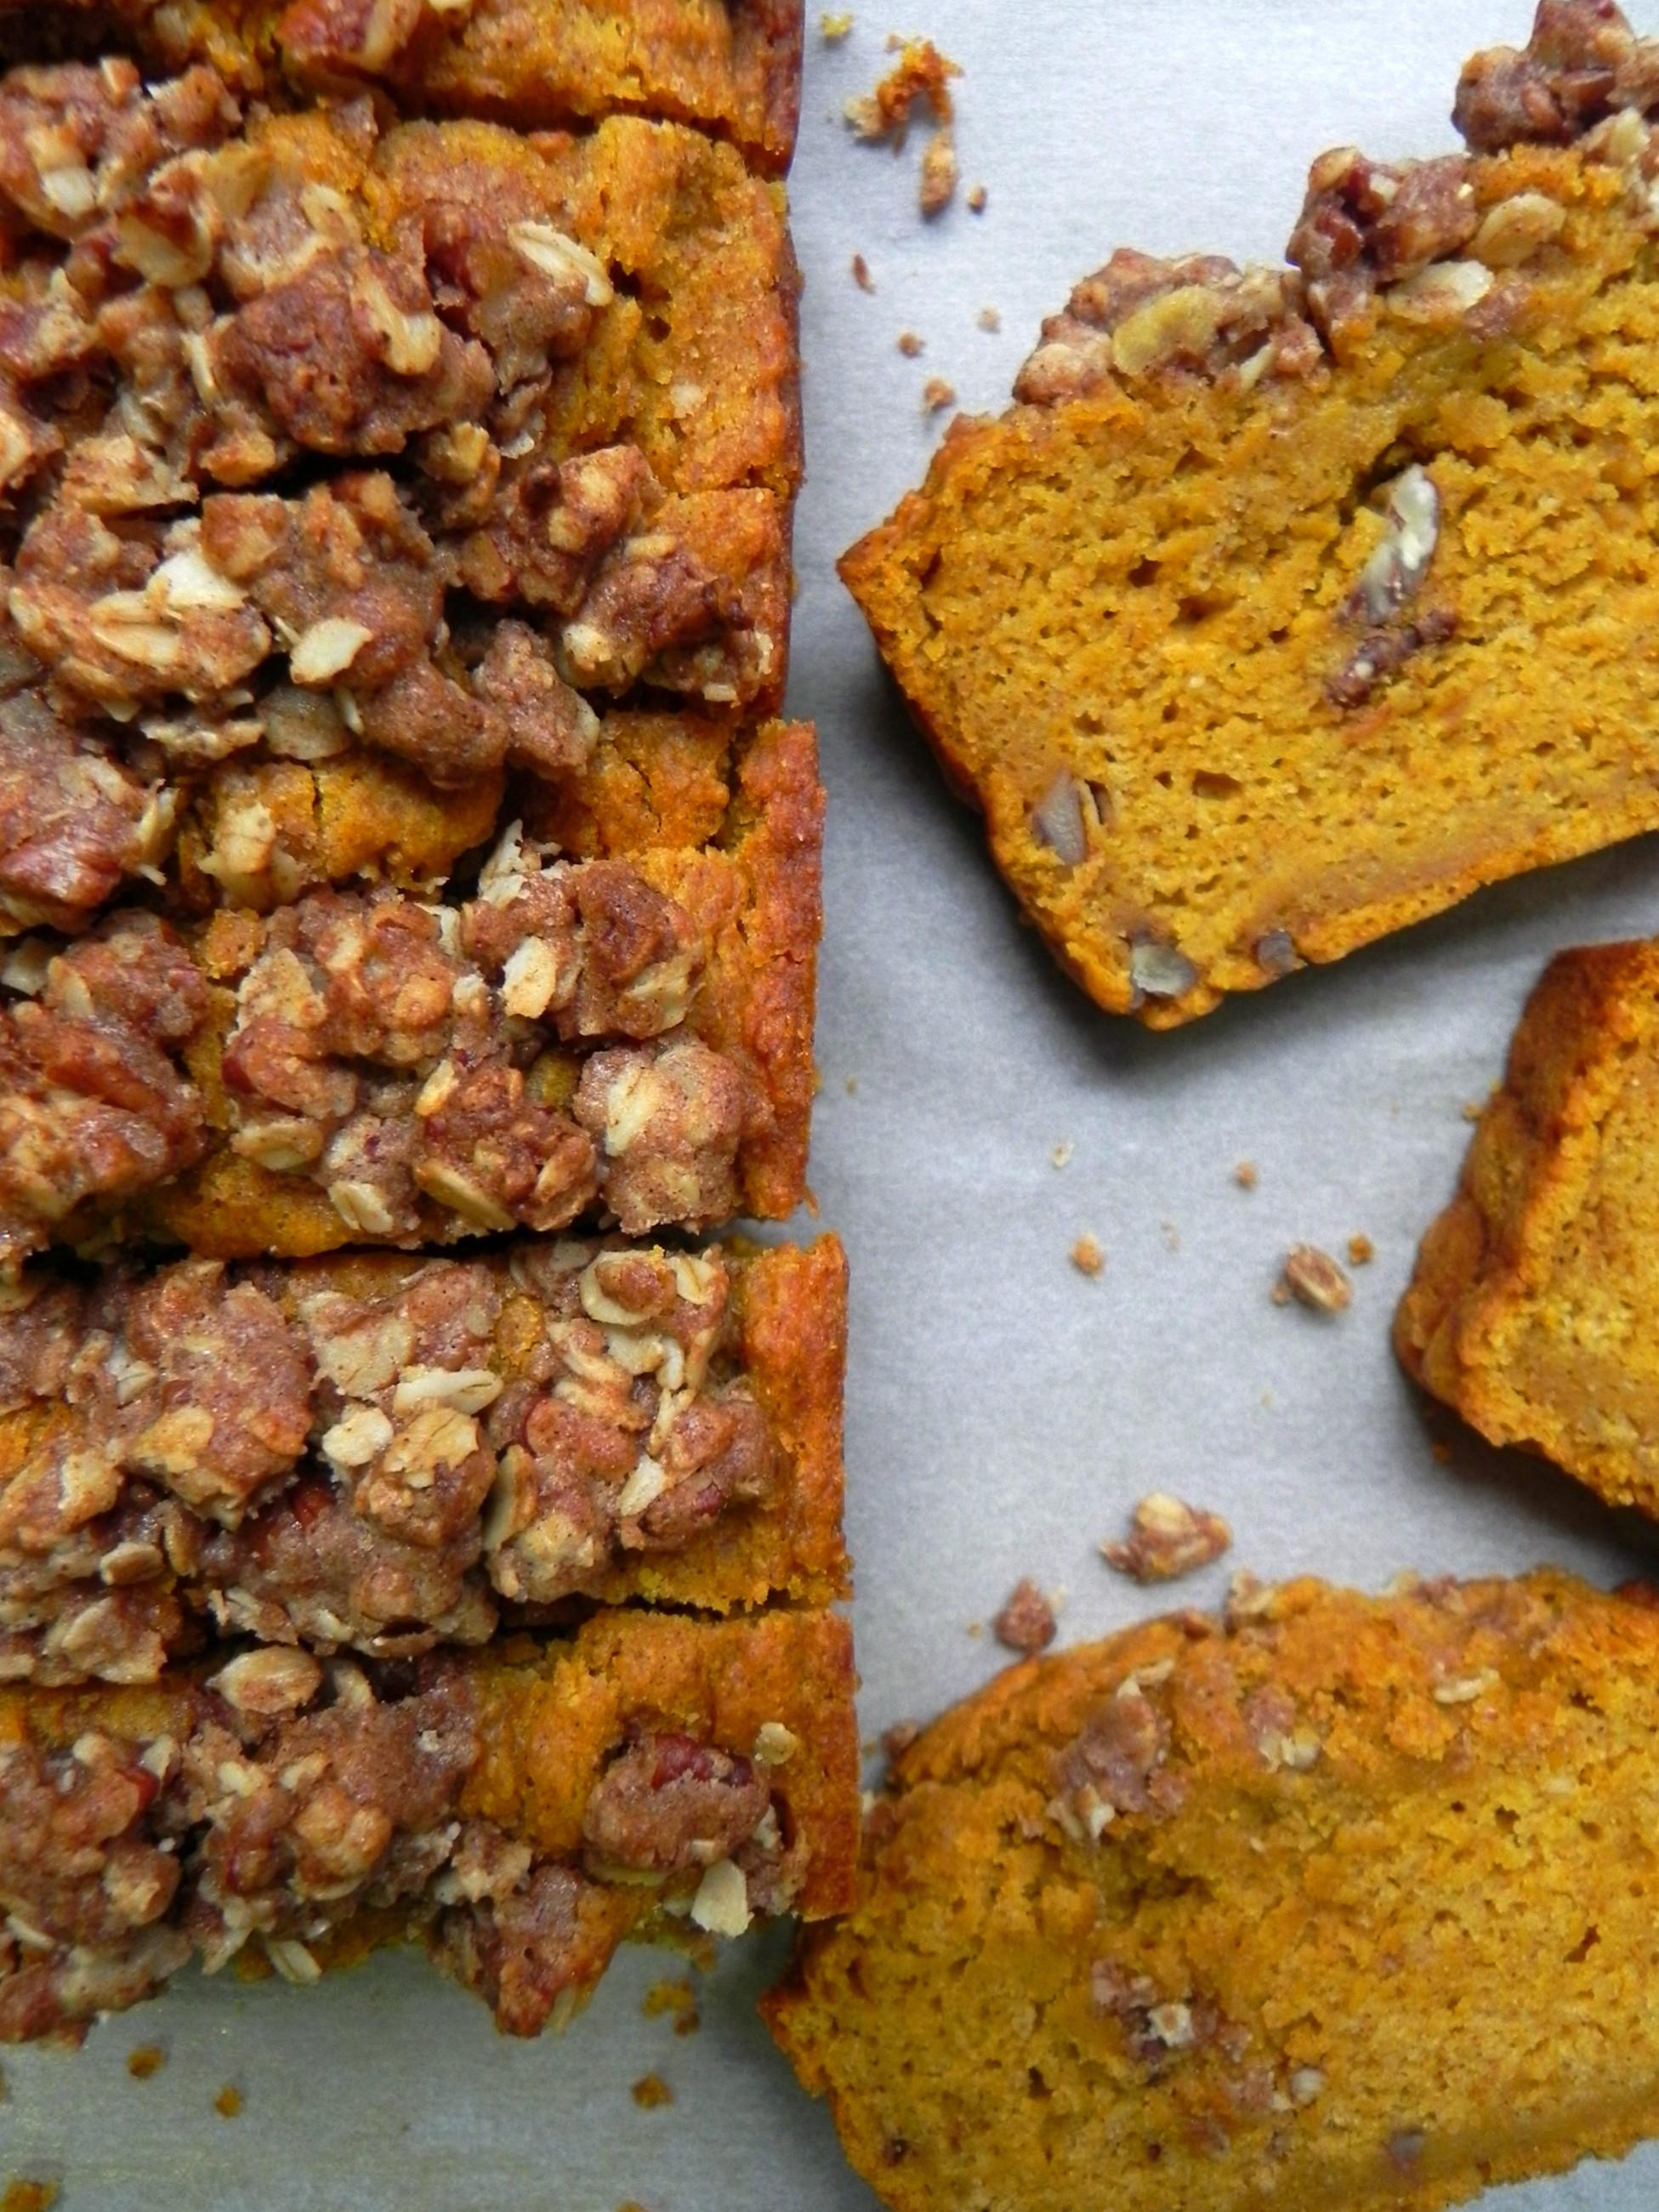 Pumpkin Bread Healthy  Healthy Pumpkin Bread with Maple Pecan Crumble Vegan